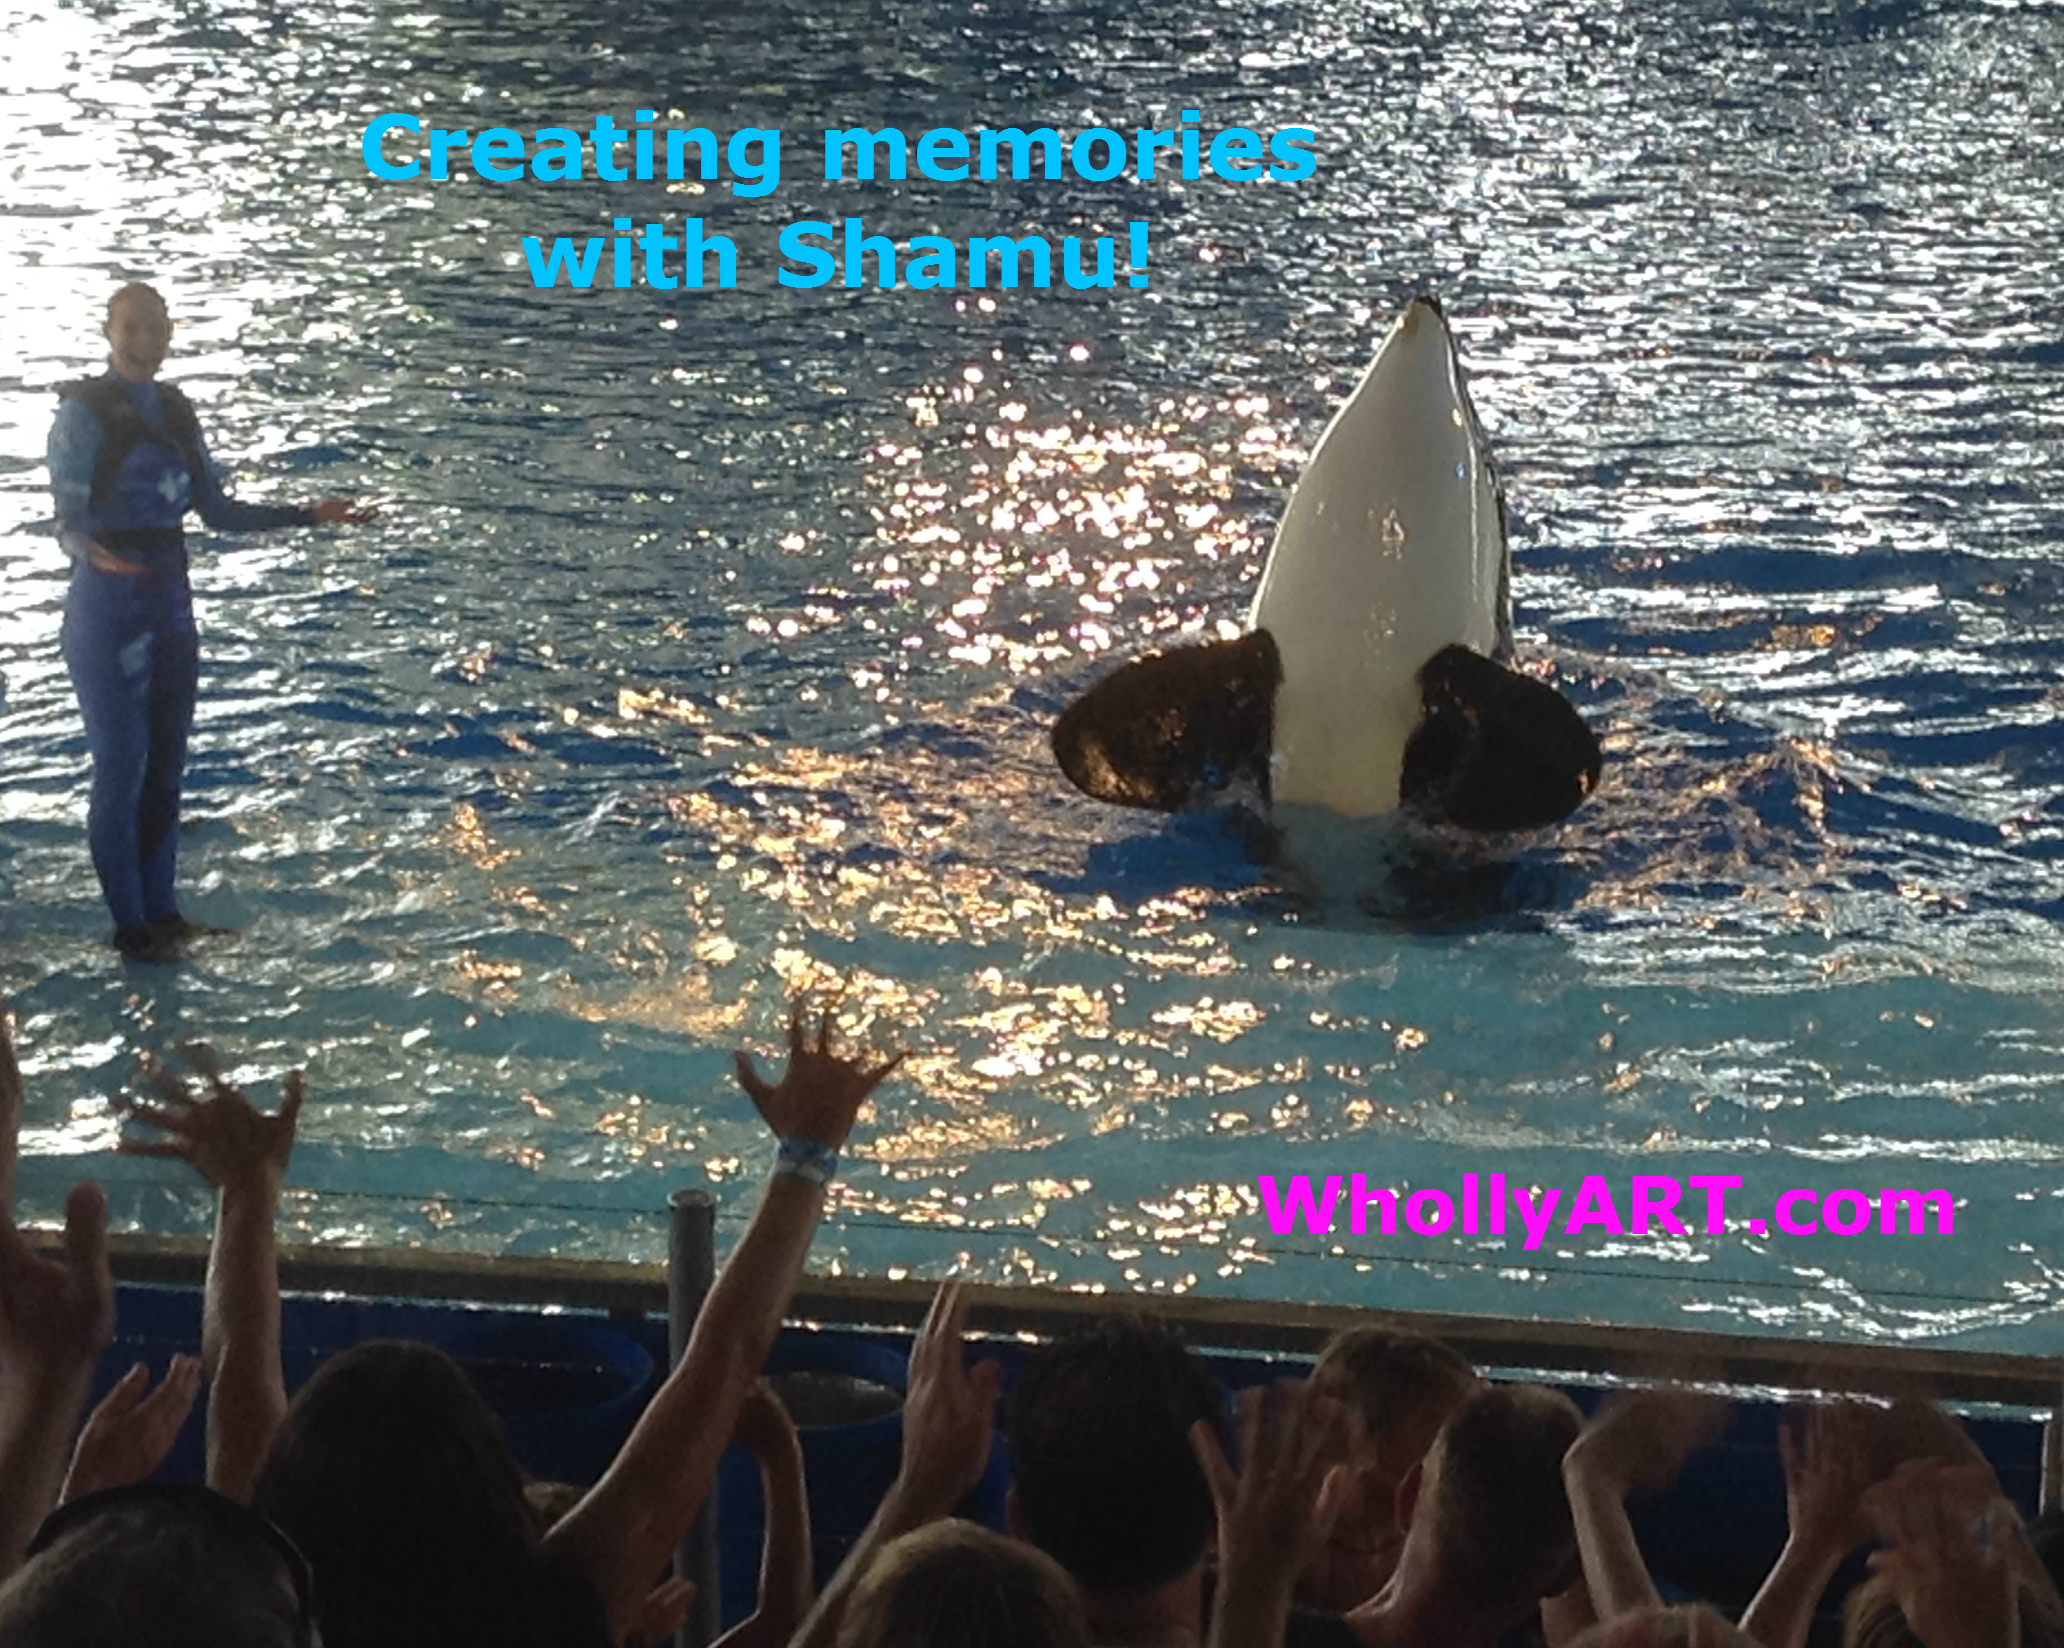 Our Time At AdventureCon14 in SeaWorld San Antonio